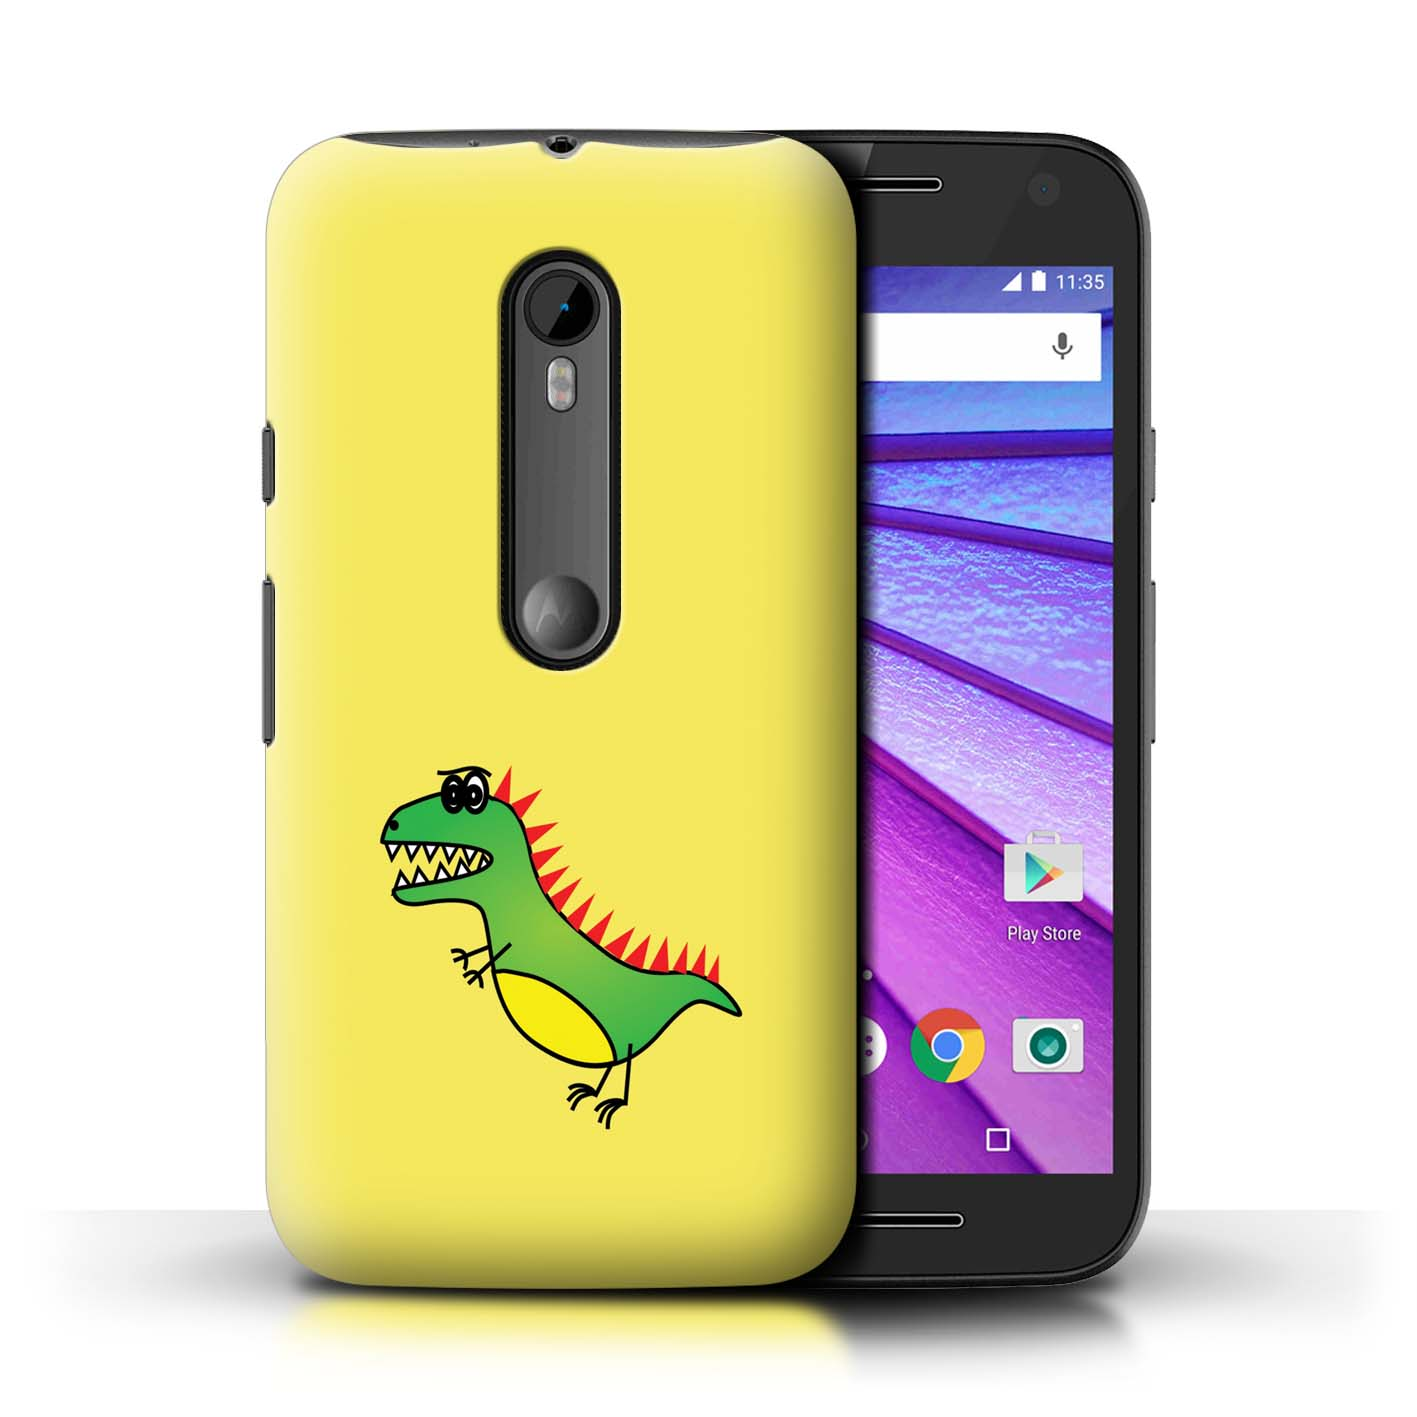 STUFF4-Back-Case-Cover-Skin-for-Motorola-Moto-G-Turbo-Edition-Cartoon-Dinosaurs